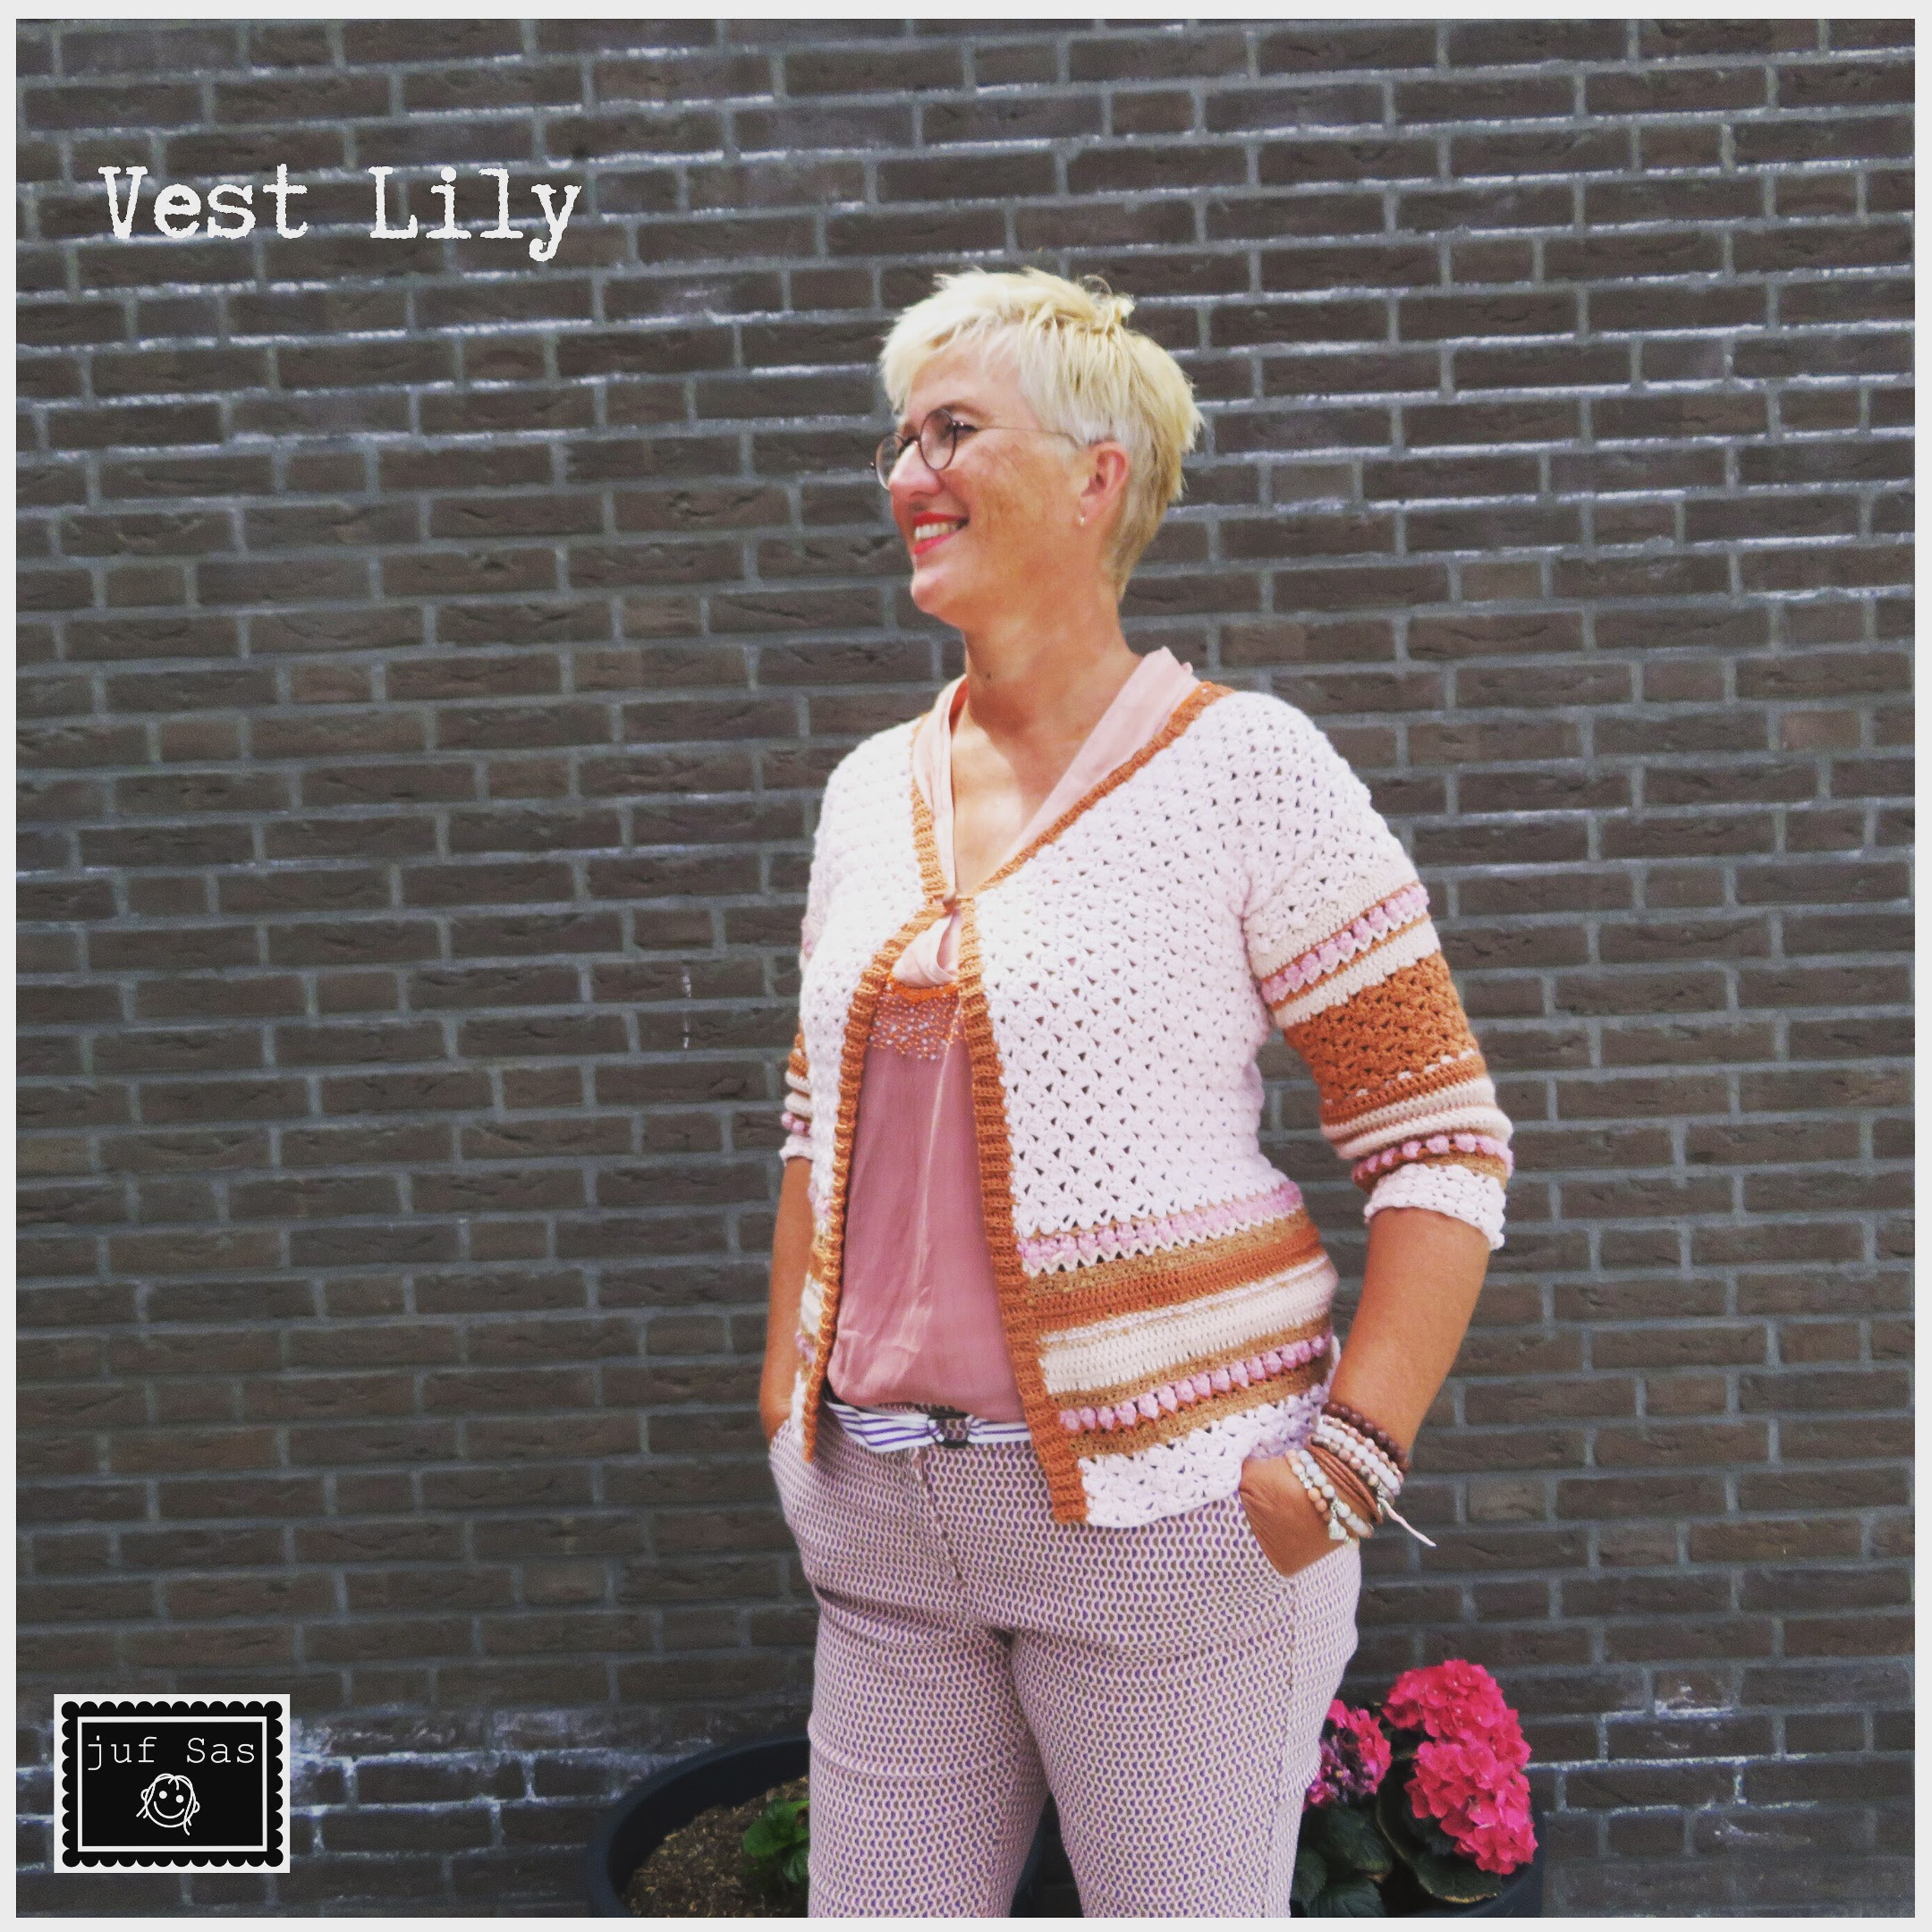 Vest Lily